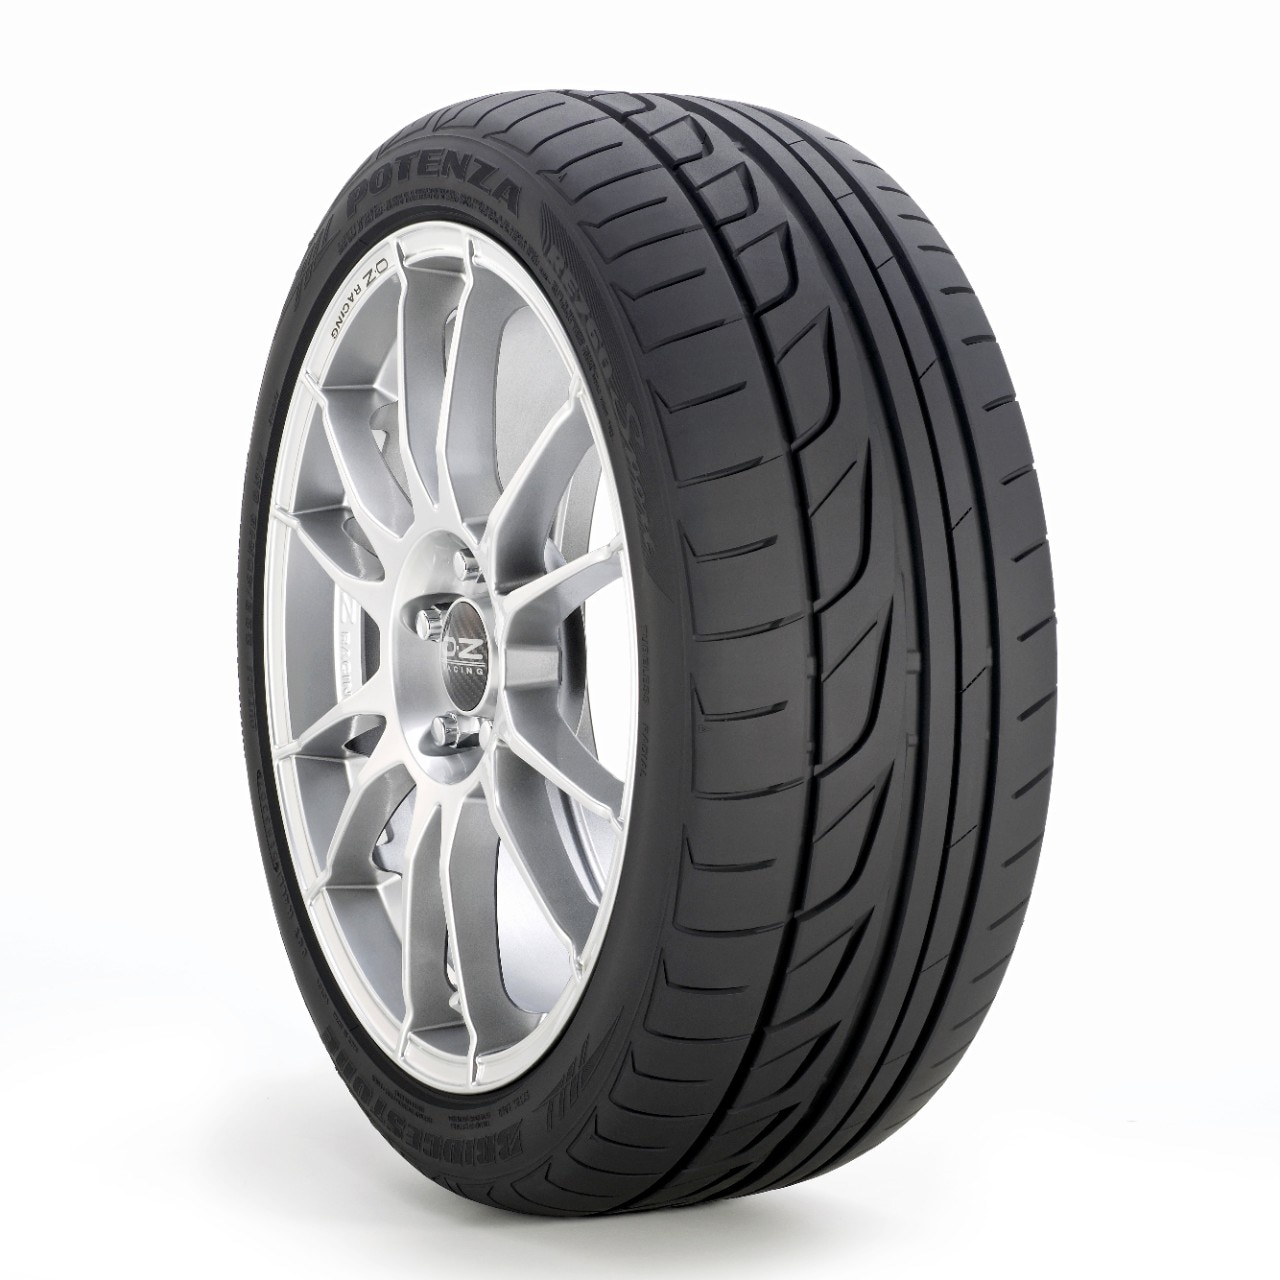 Potenza Re760 Sport >> Bridgestone Potenza Re760 Sport Tire Grip For Wet Dry Roads